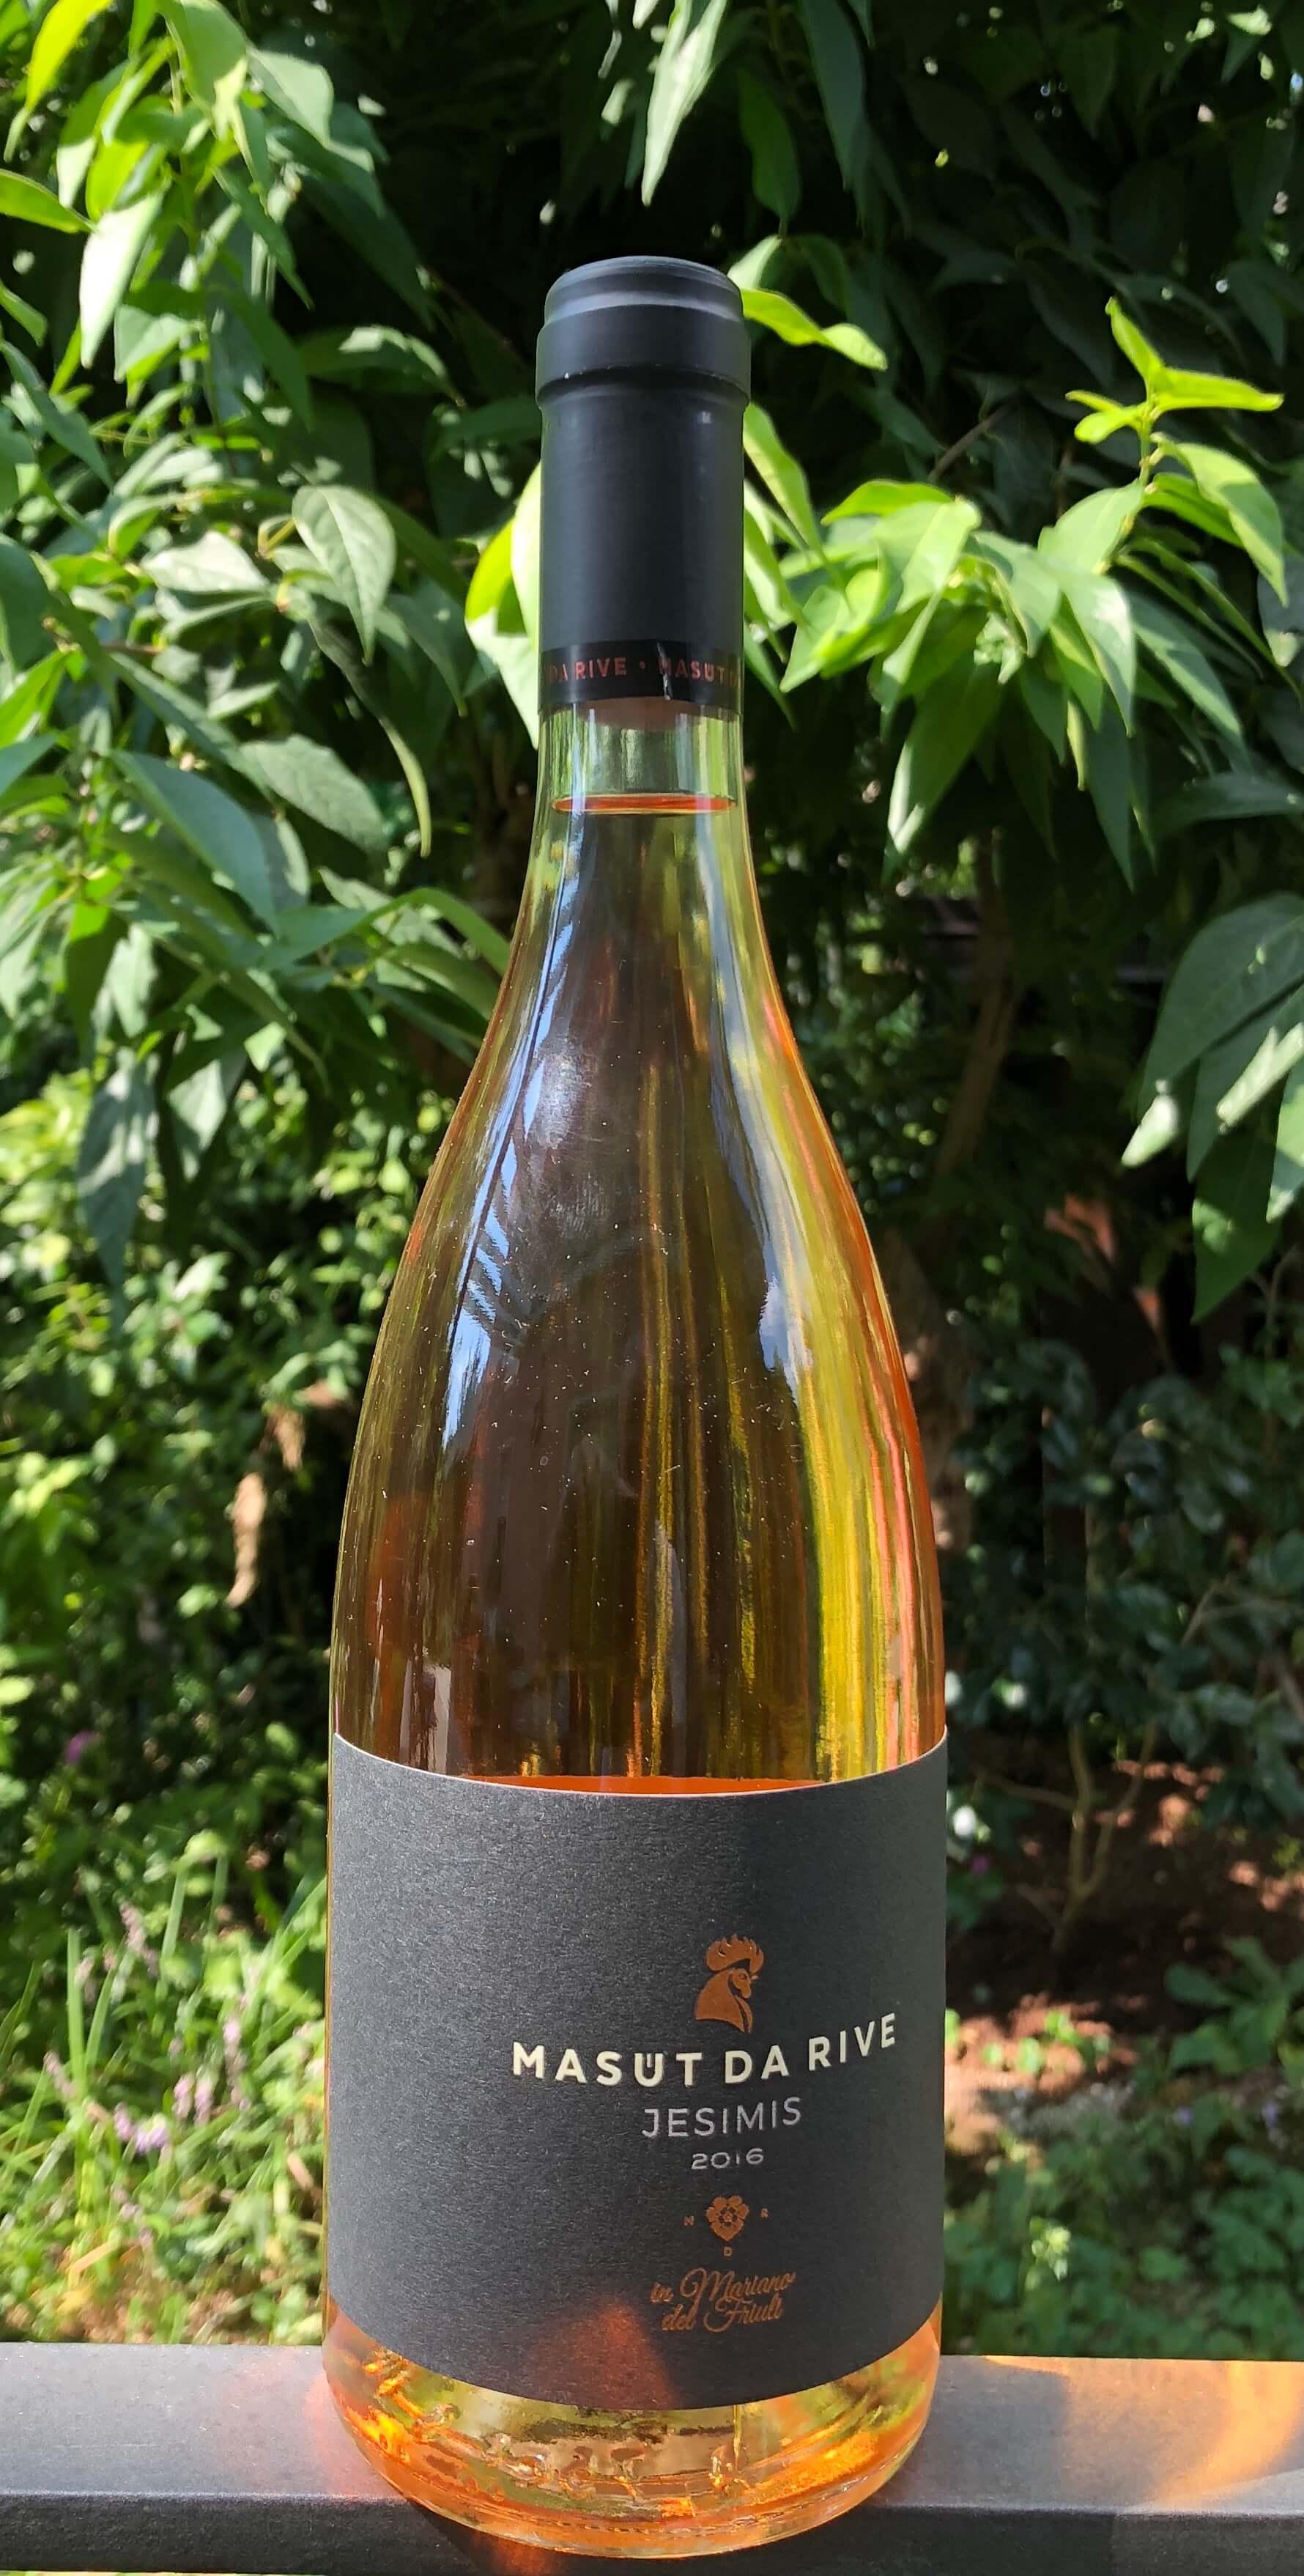 Masùt da Rive Pinot GRIGIO Jesimis, ph fabbro, 2018